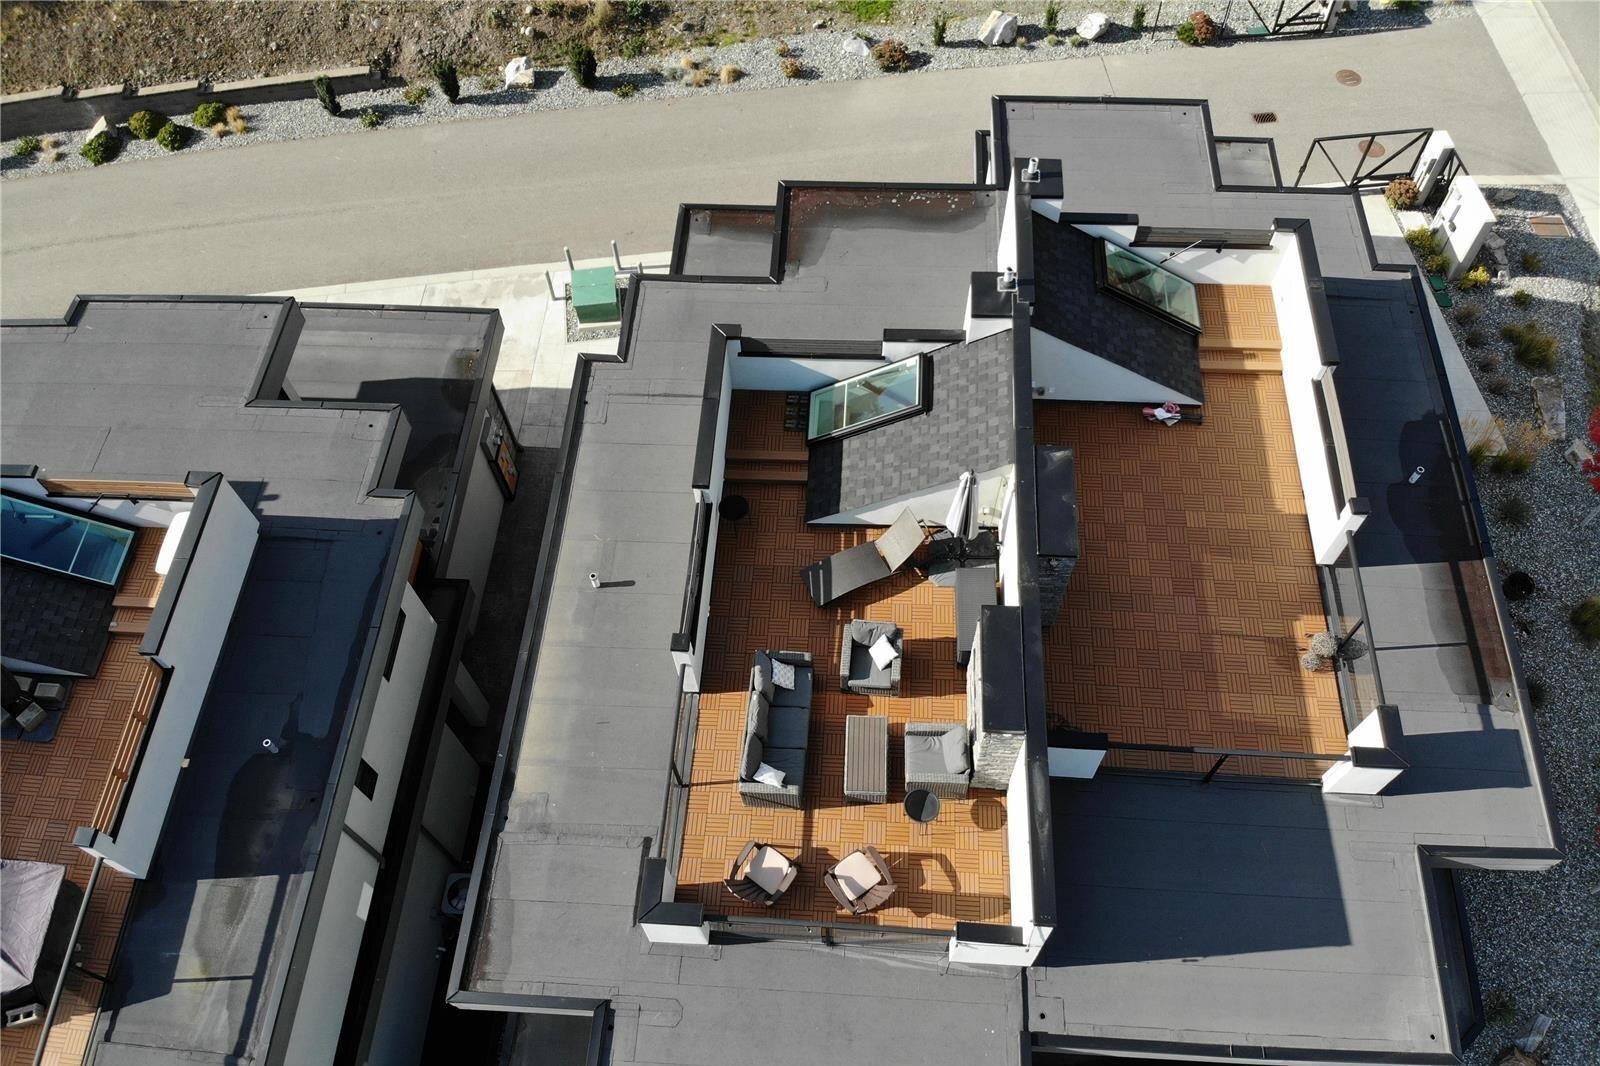 Townhouse for sale at 2331 Tallus Ridge Dr Unit 2 West Kelowna British Columbia - MLS: 10221383